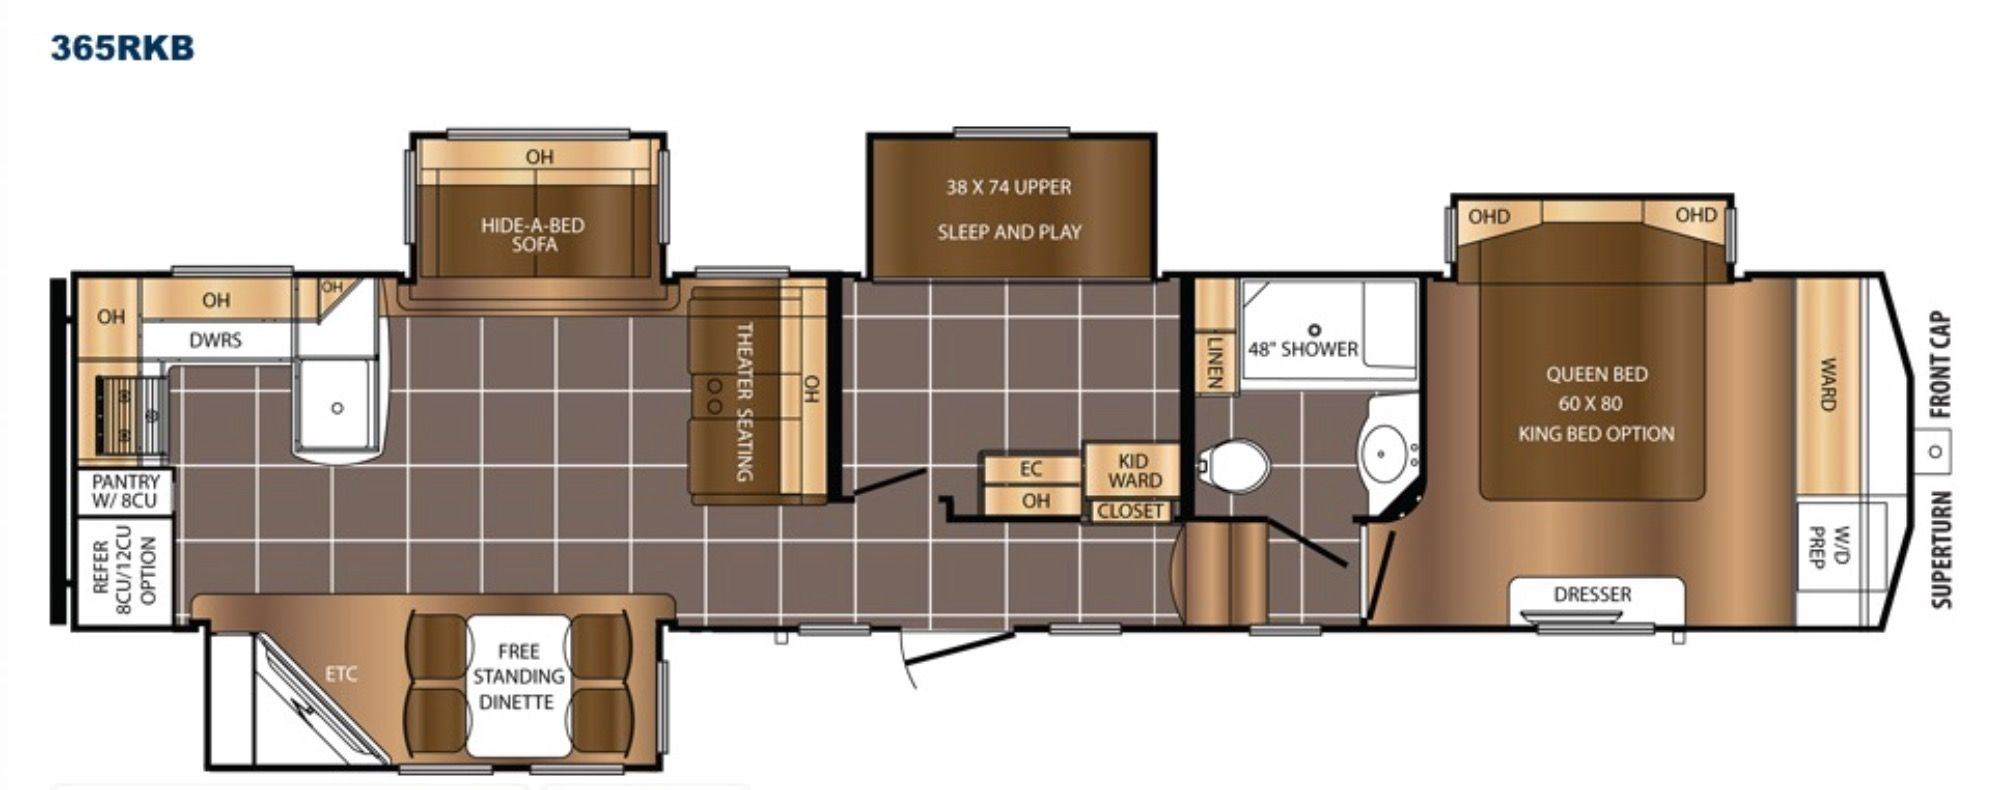 Floor Plan Travel trailer floor plans, Camper flooring